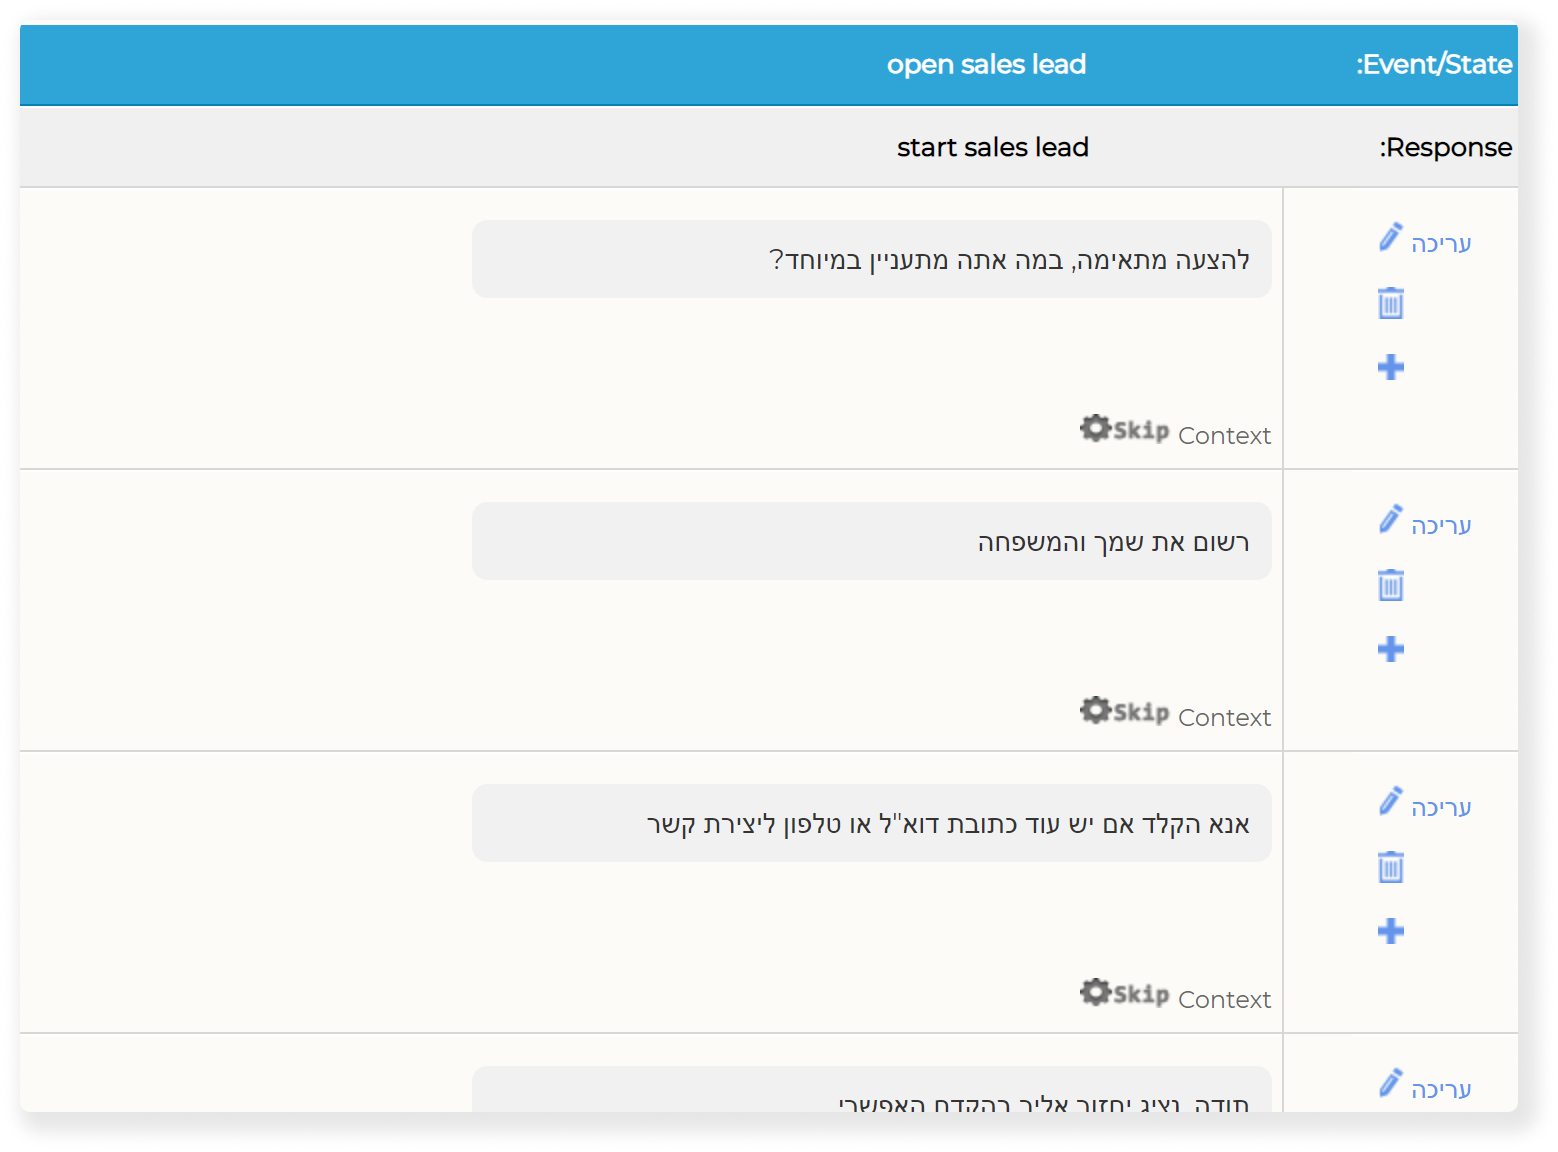 chatscripts edit open sales leads